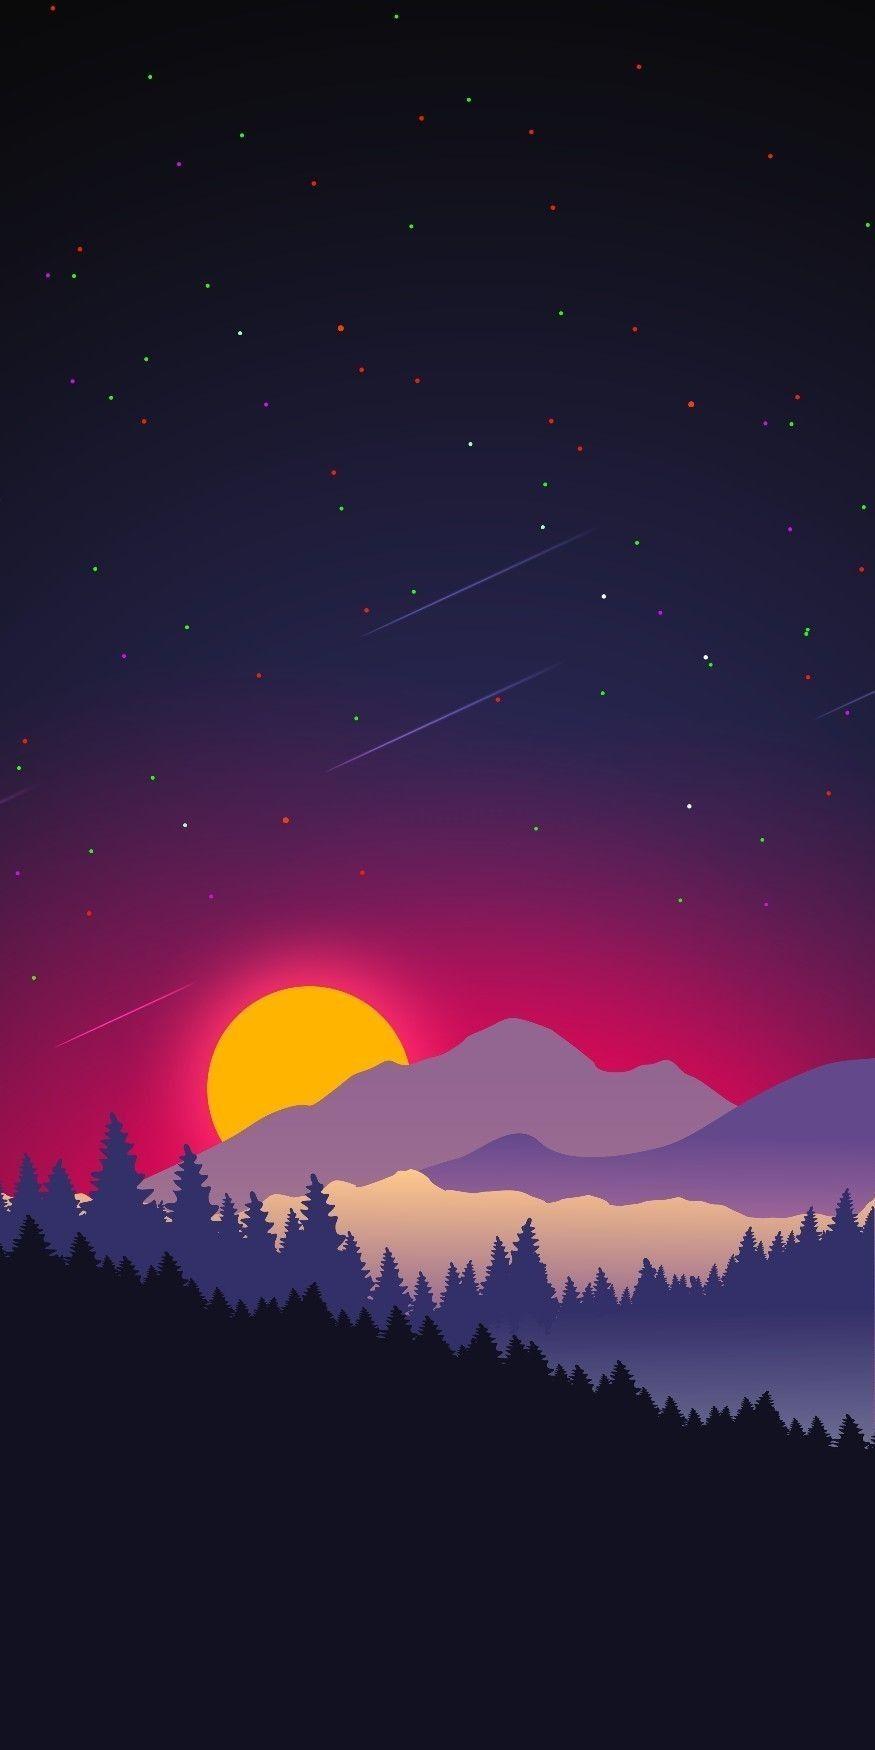 50 Best Illustration Wallpaper For Phone Graphic wallpaper 875x1750